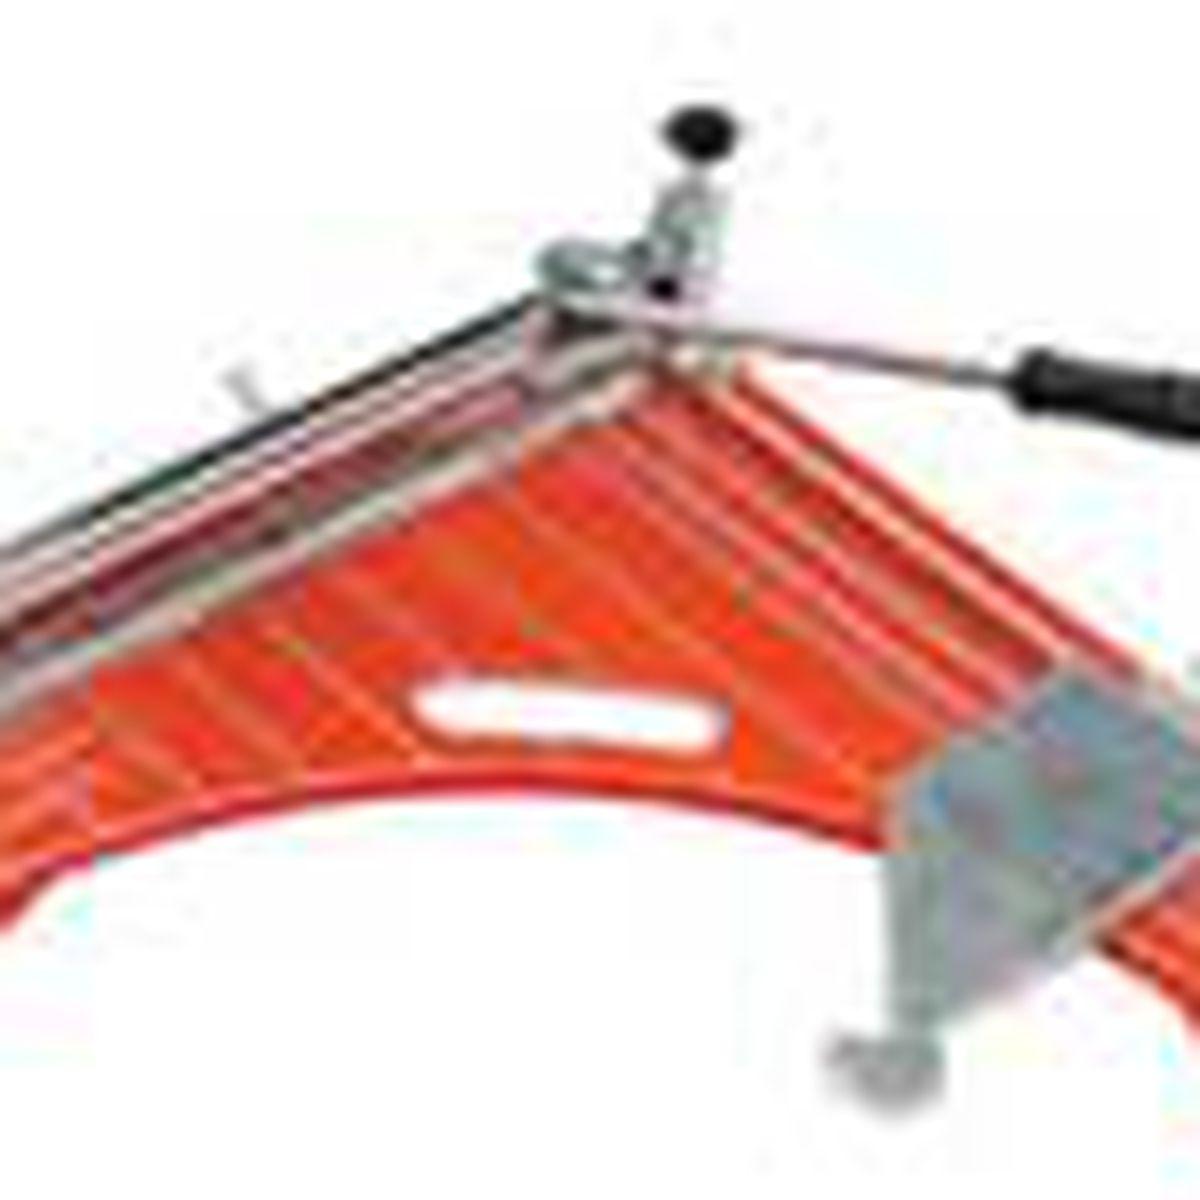 vinyl tile cutter